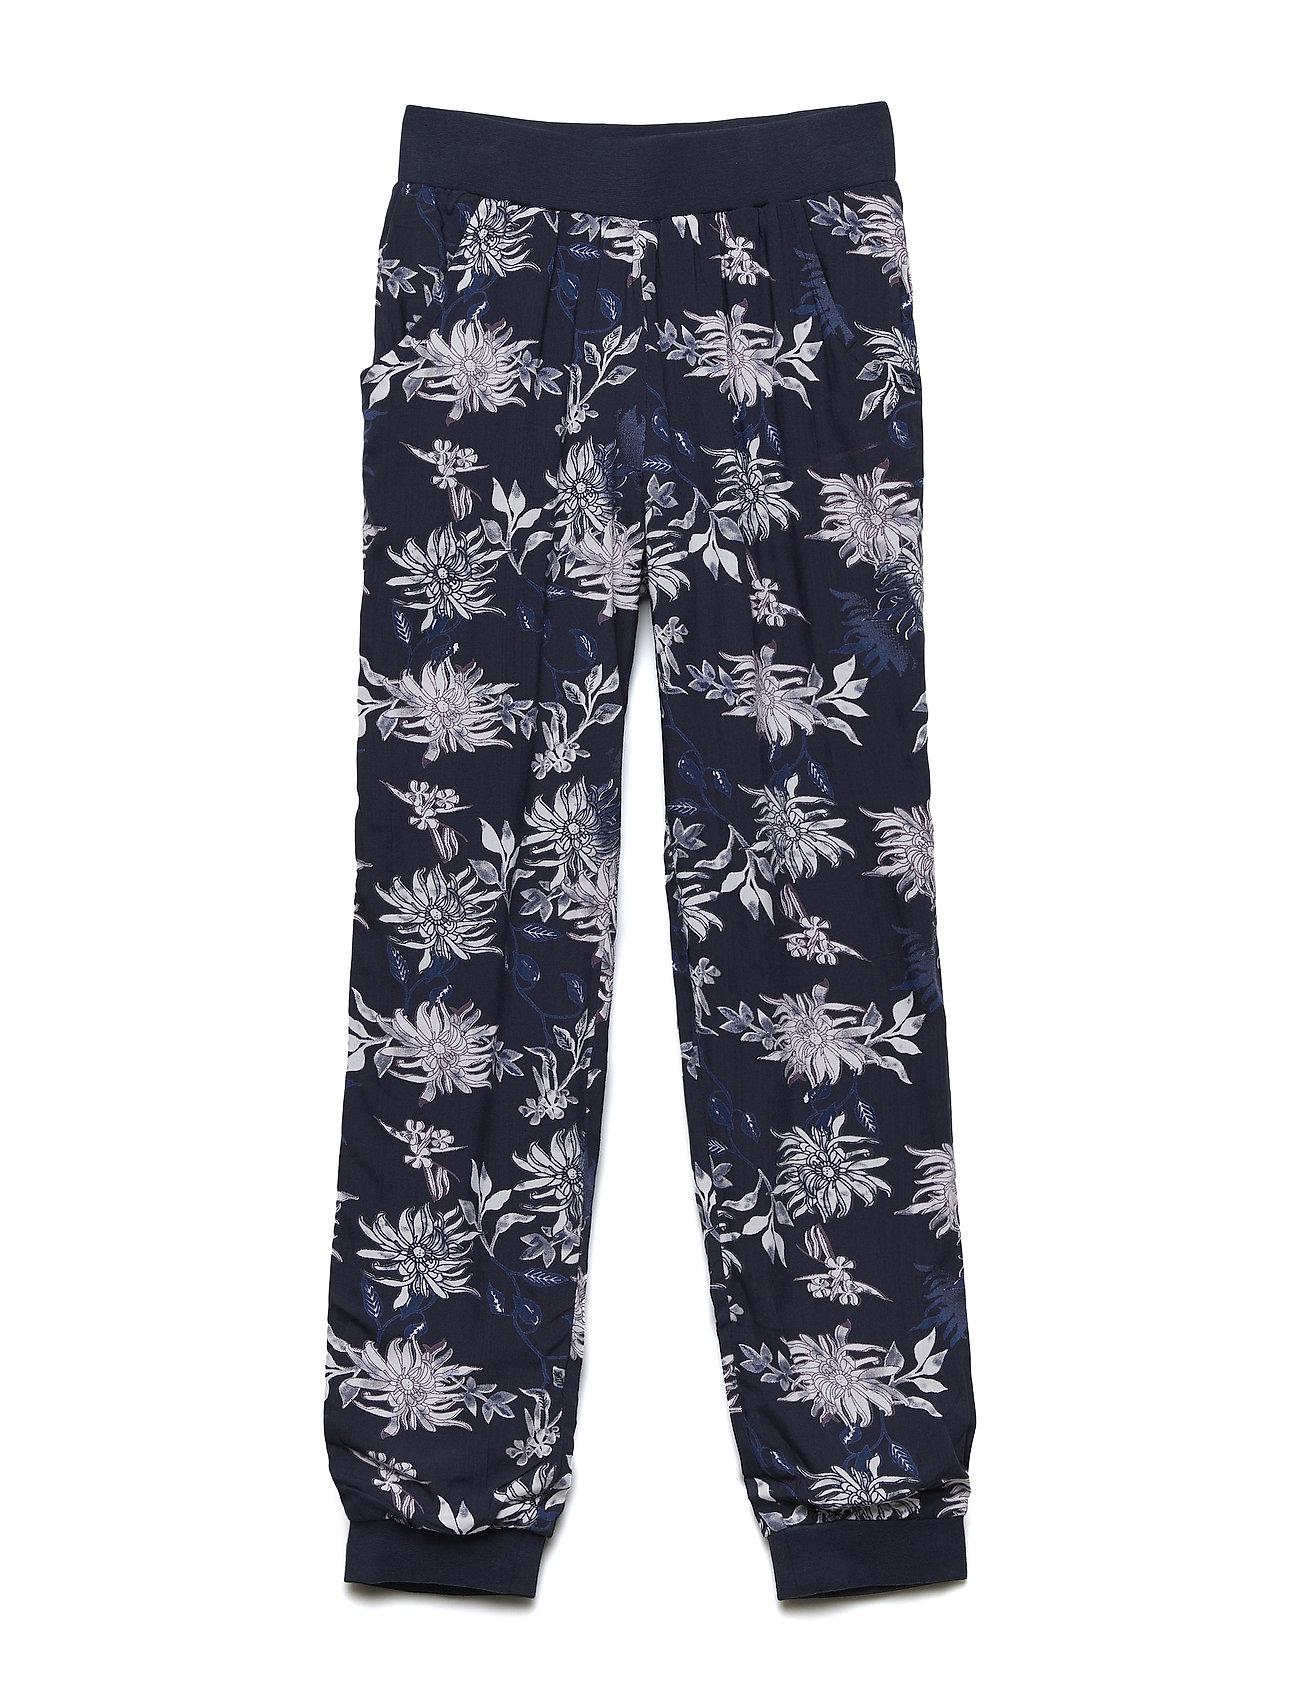 Pants W. Flower Aop - Minymo